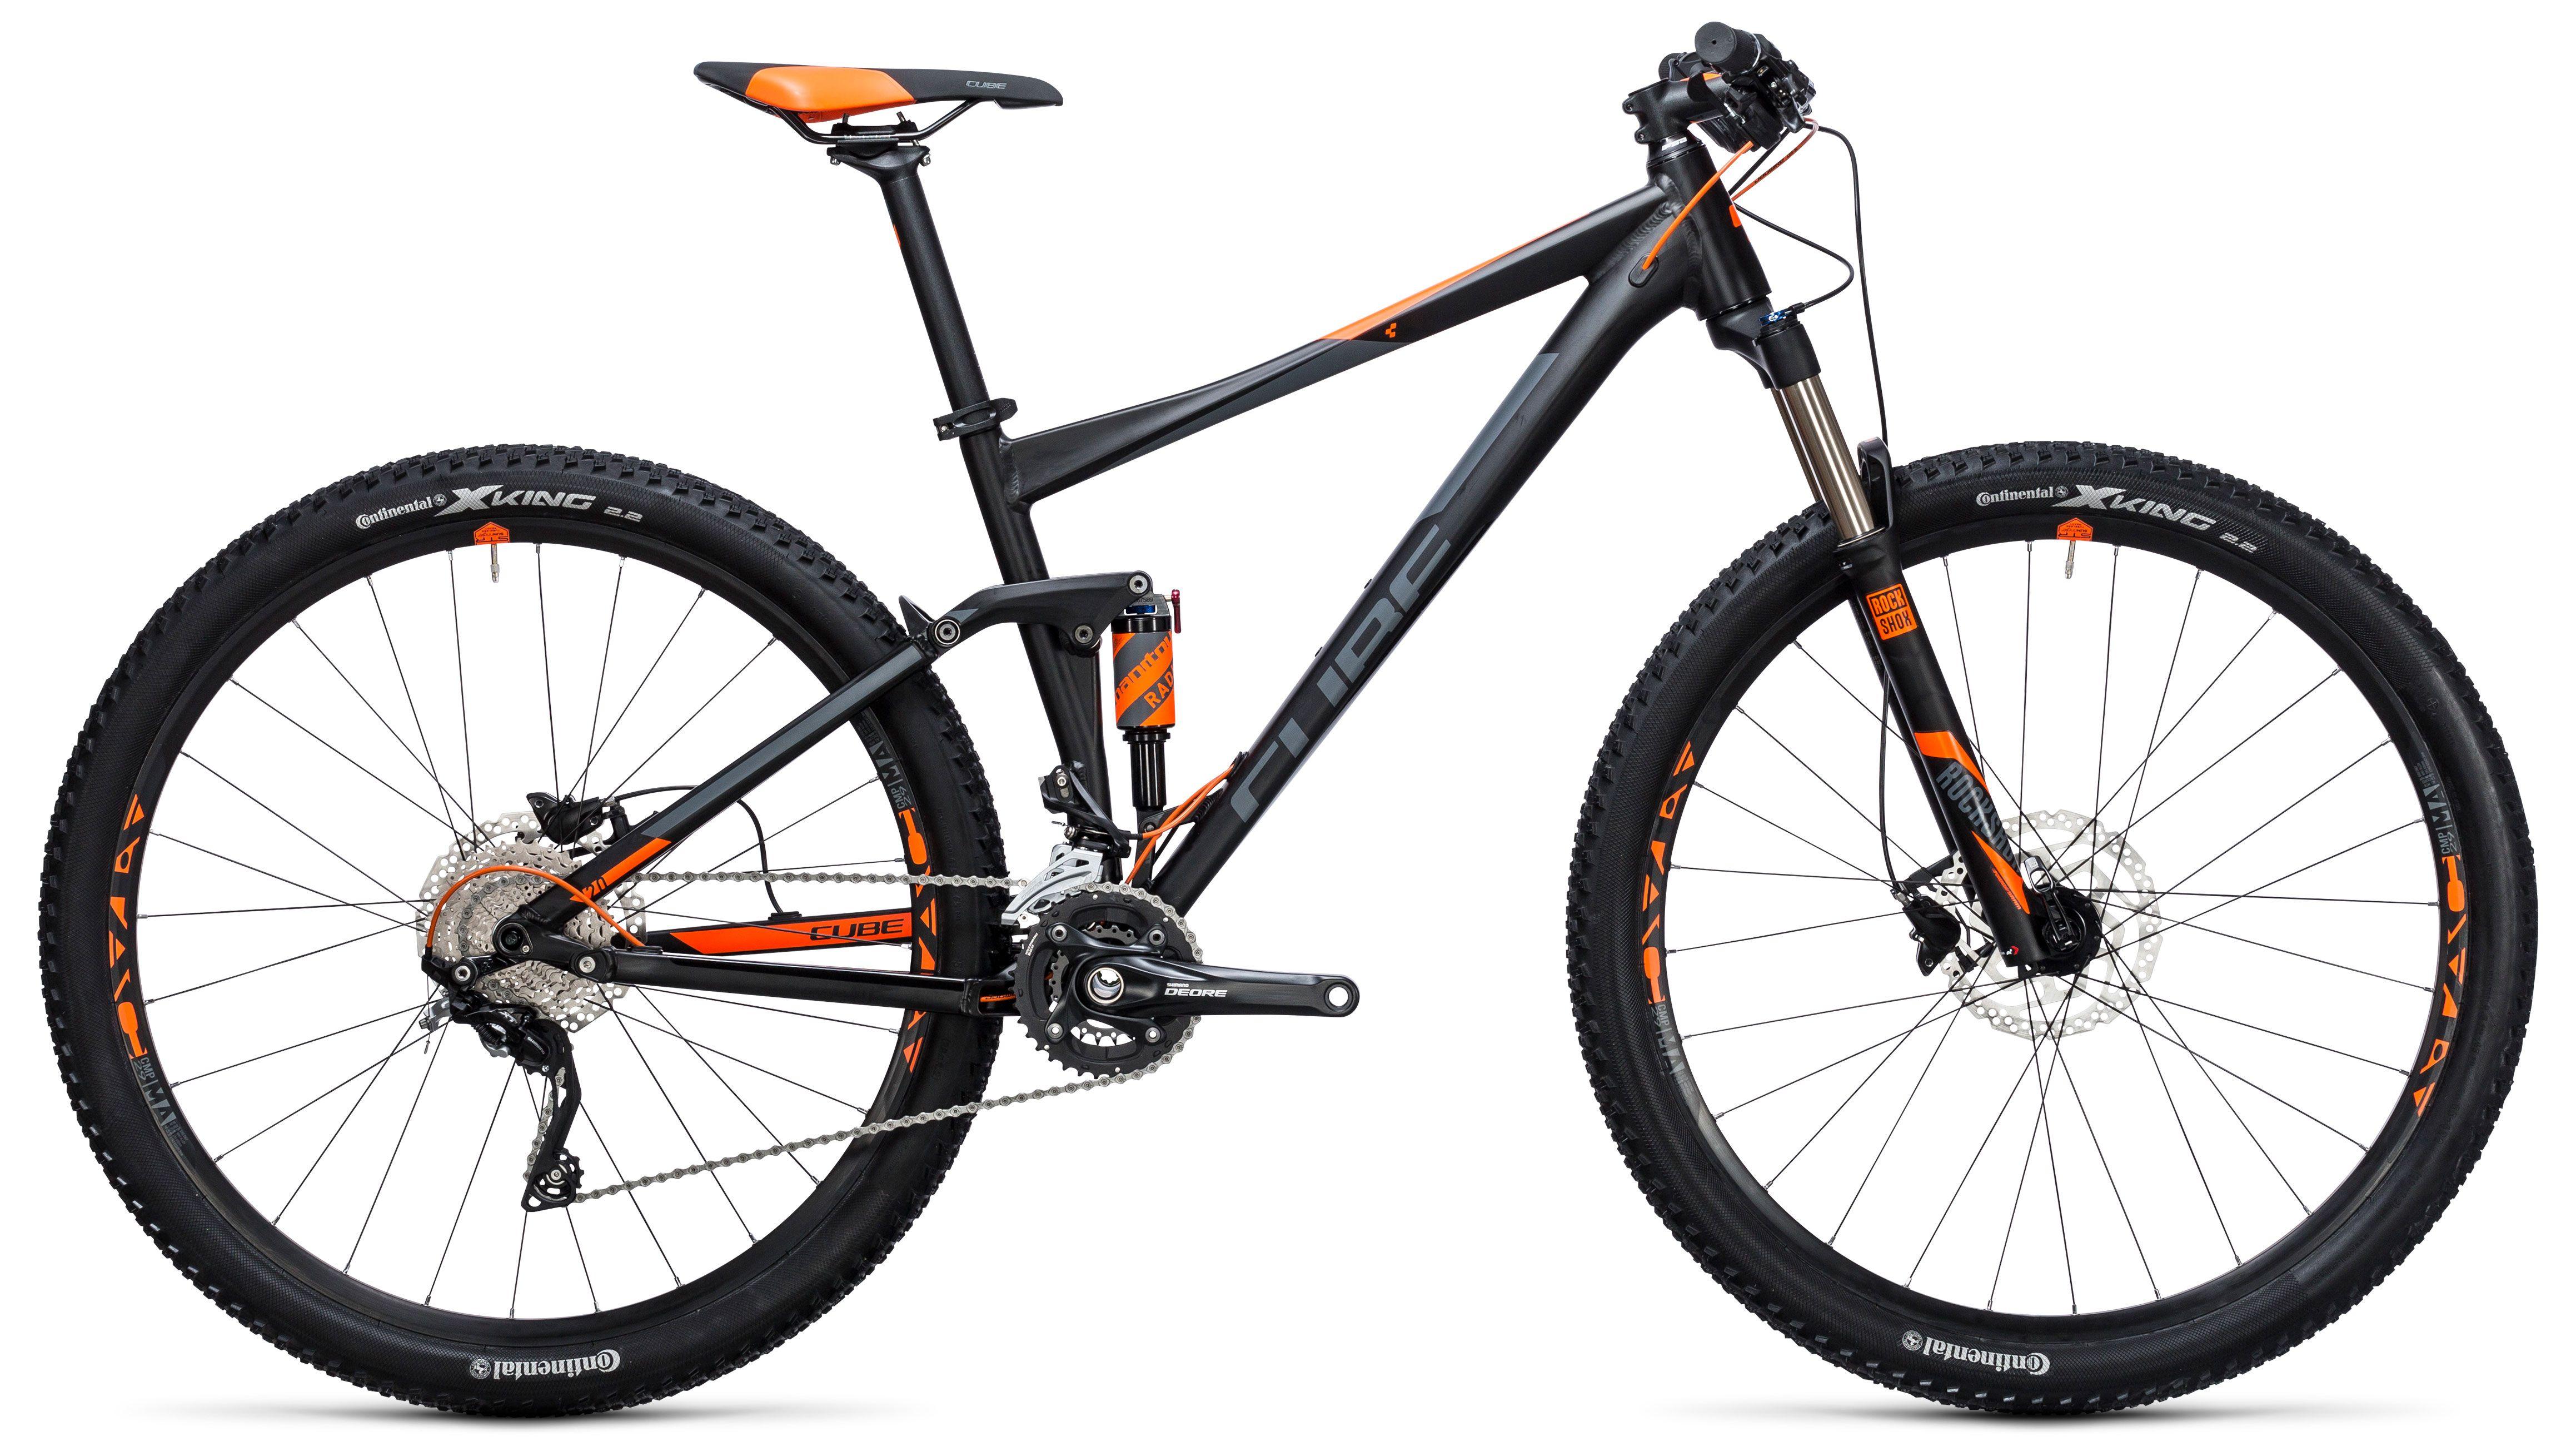 Велосипед Cube Stereo 120 HPA PRO 29 2017,  Двухподвесы  - артикул:273172